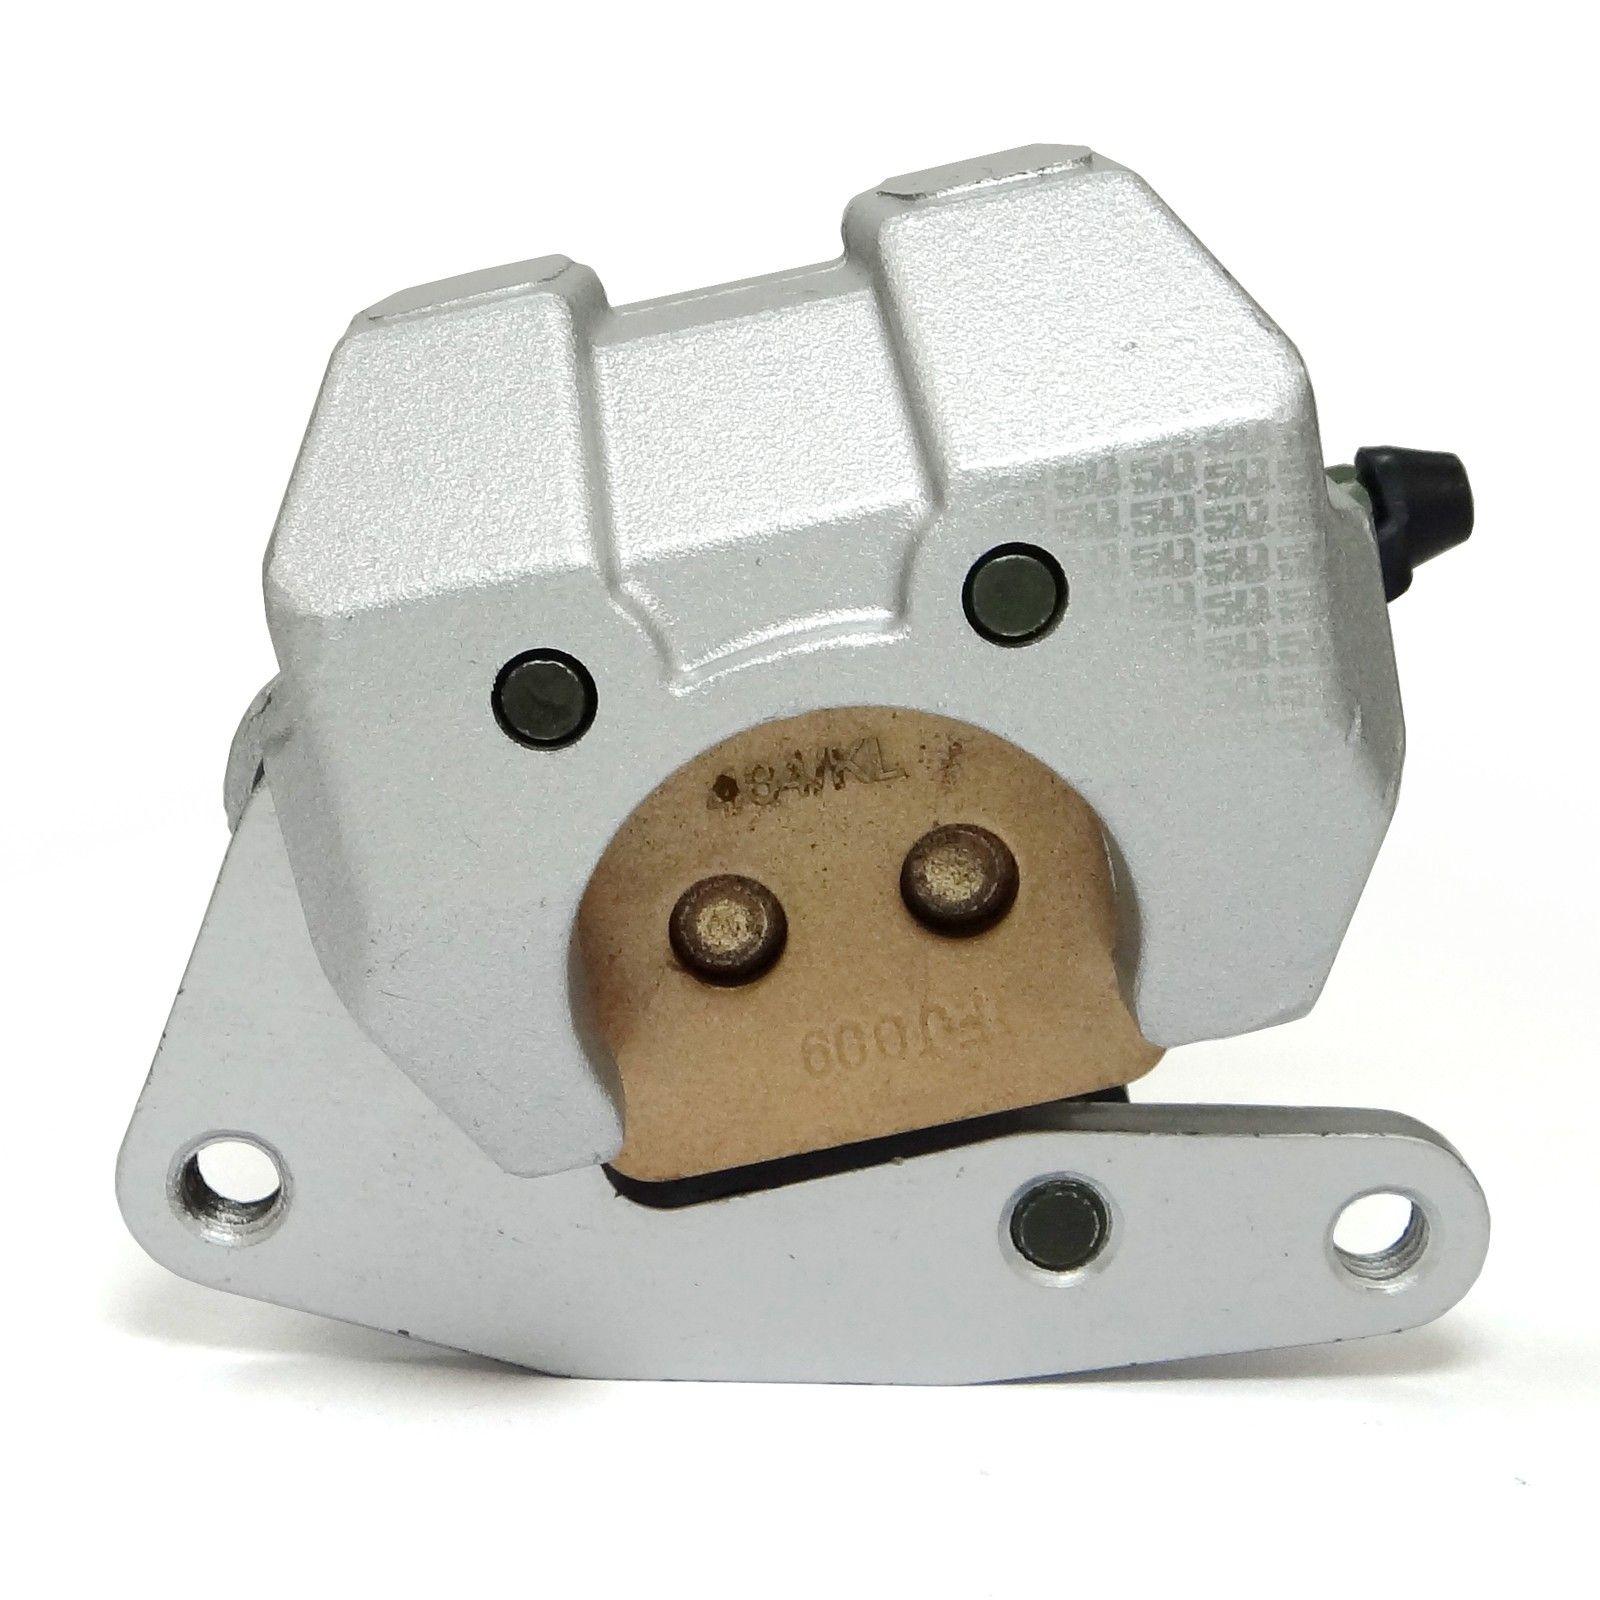 Yamaha ATV Brake Caliper Kodiak 400 450 YFM400 YFM450 with Pad STOCK REPLACEMENT